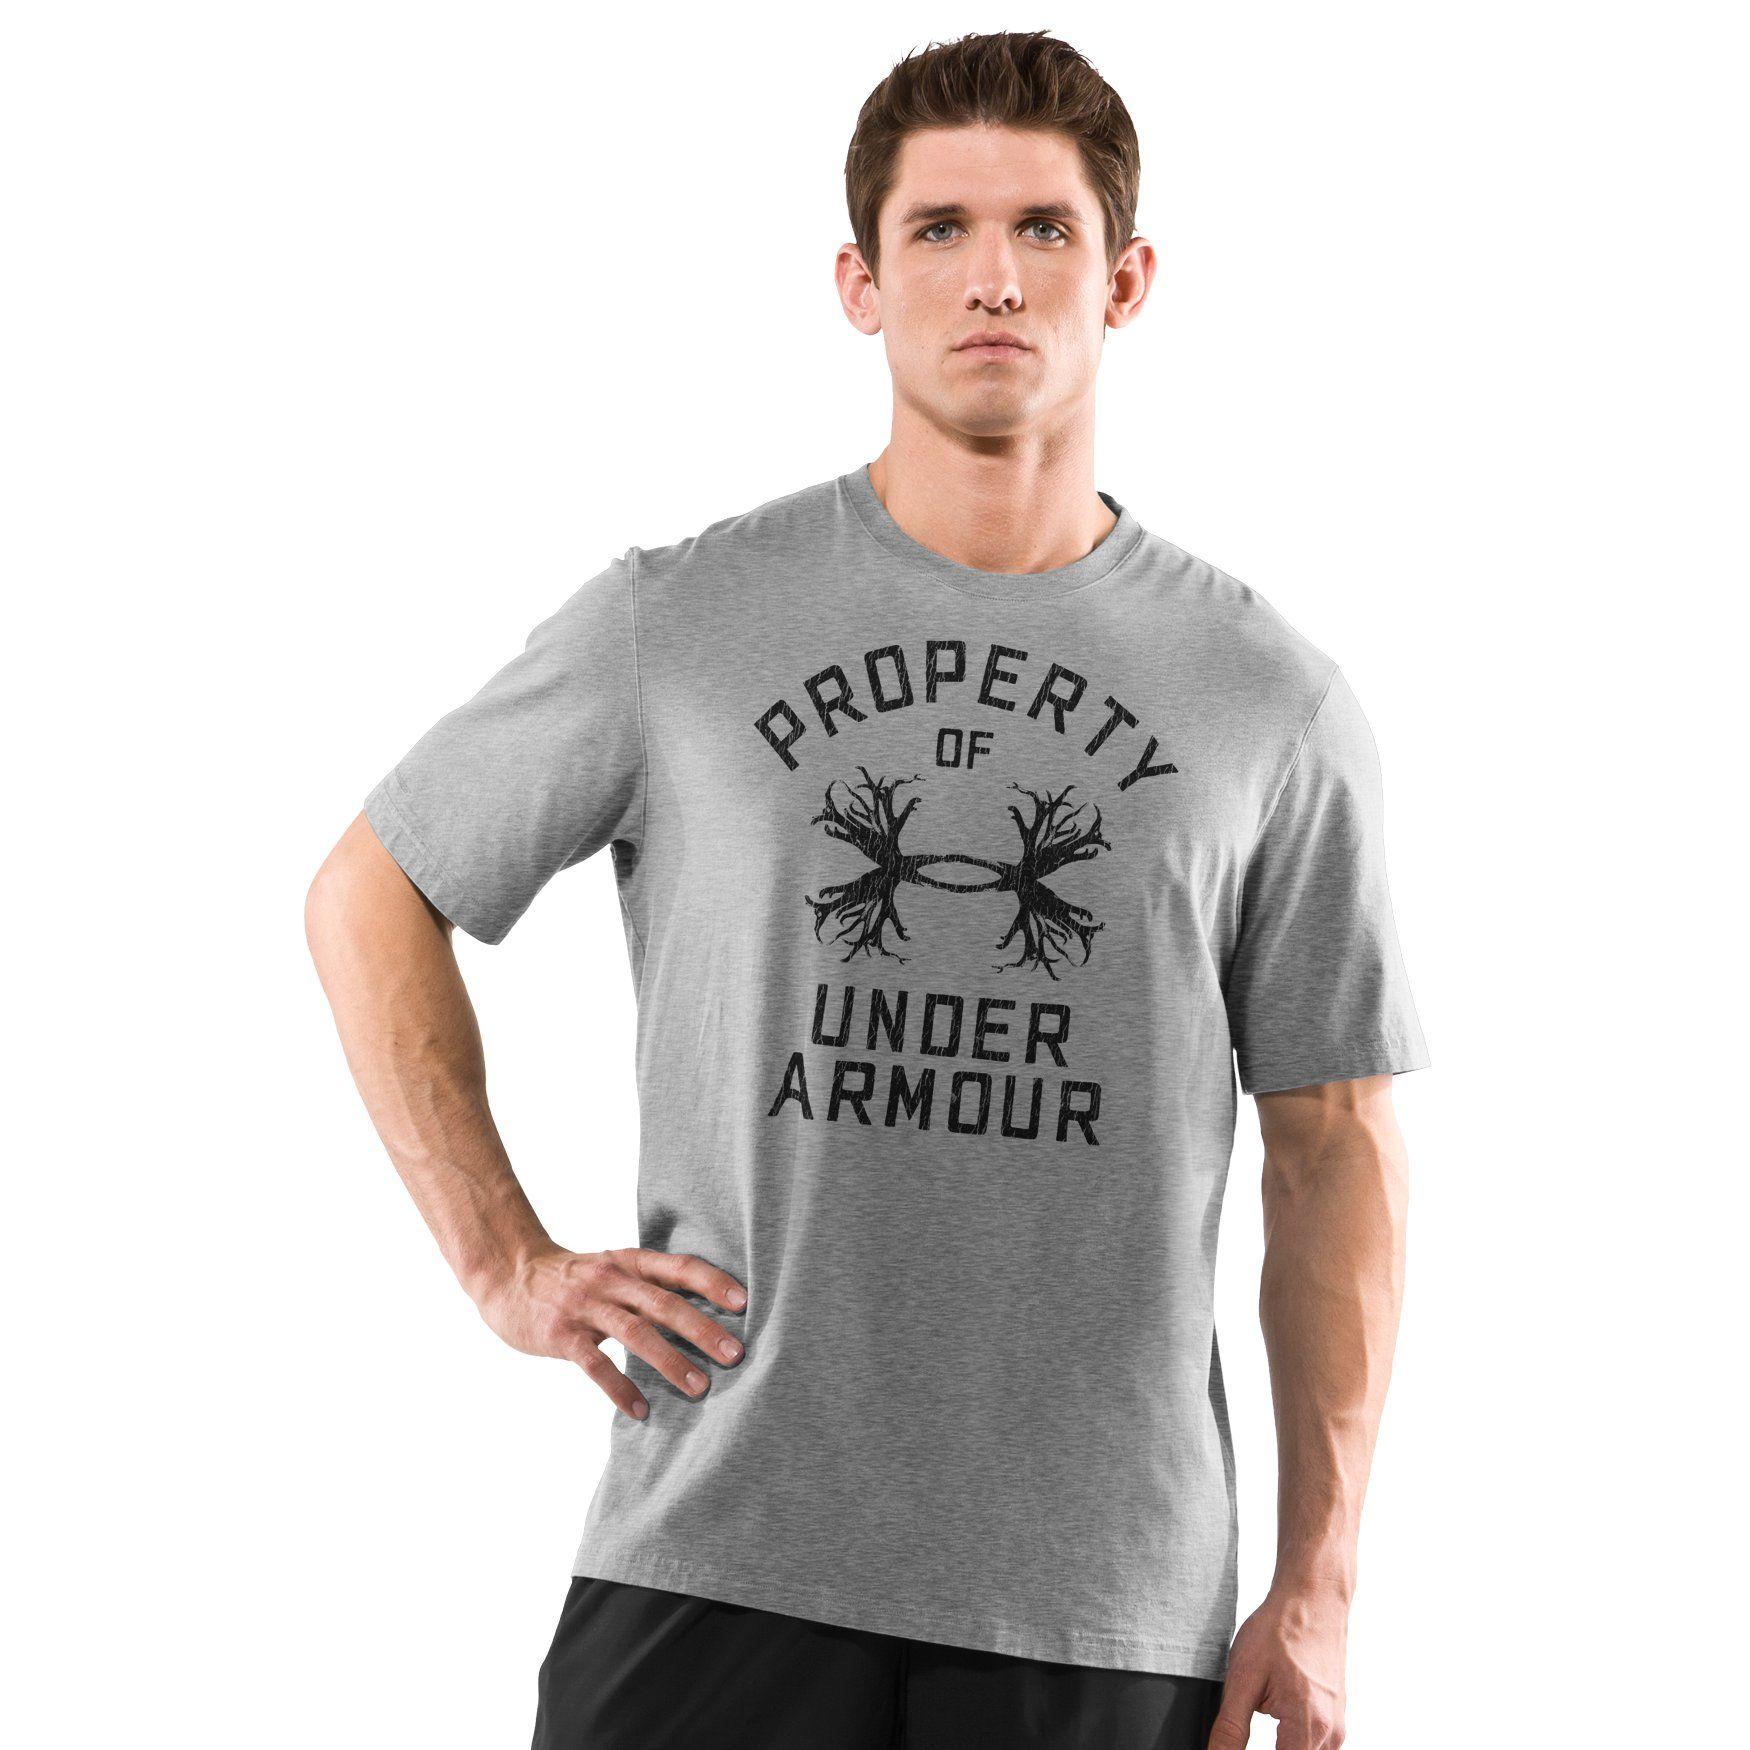 Under Armour Men's UA Antler Property Graphic T-Shirt